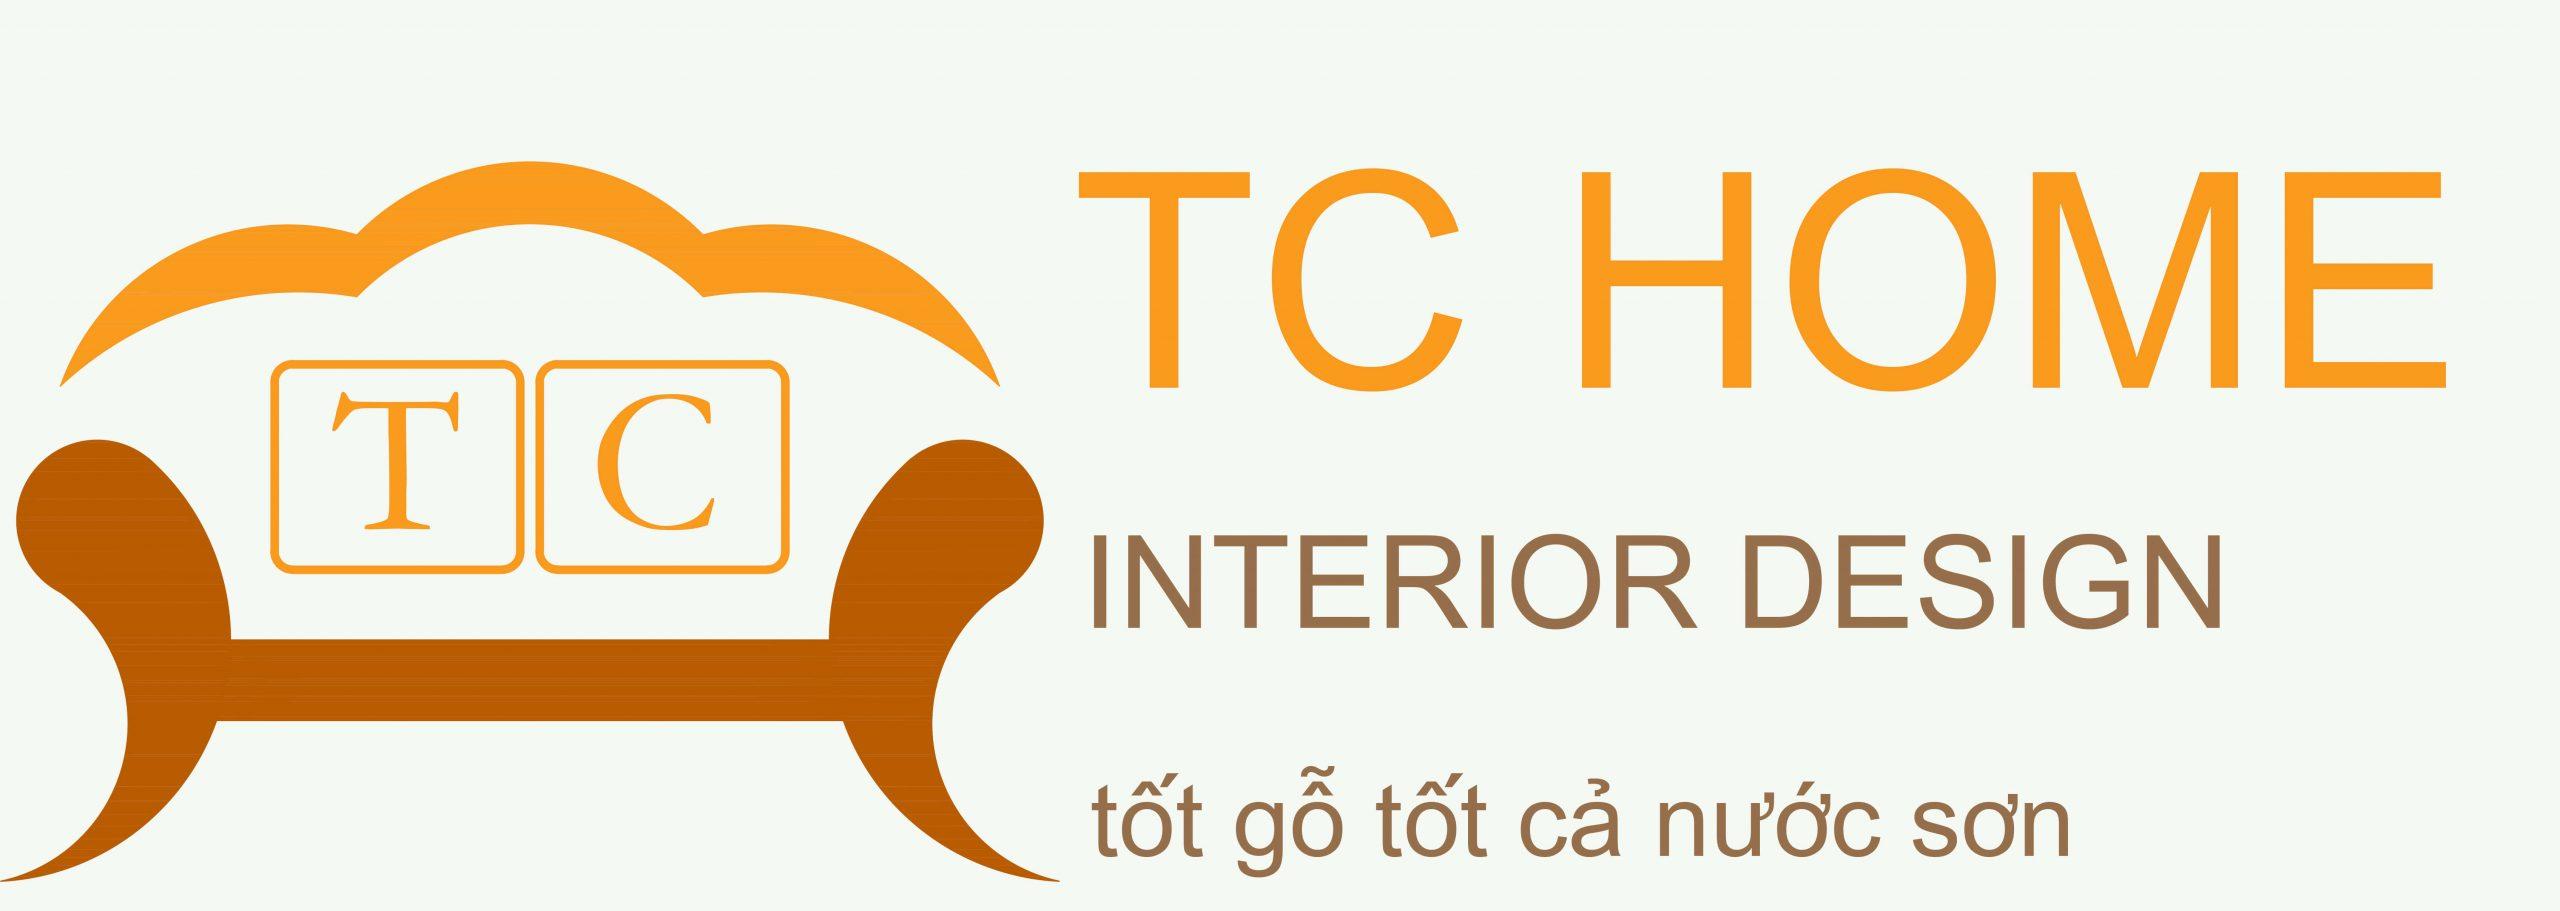 Nội thất TC Home